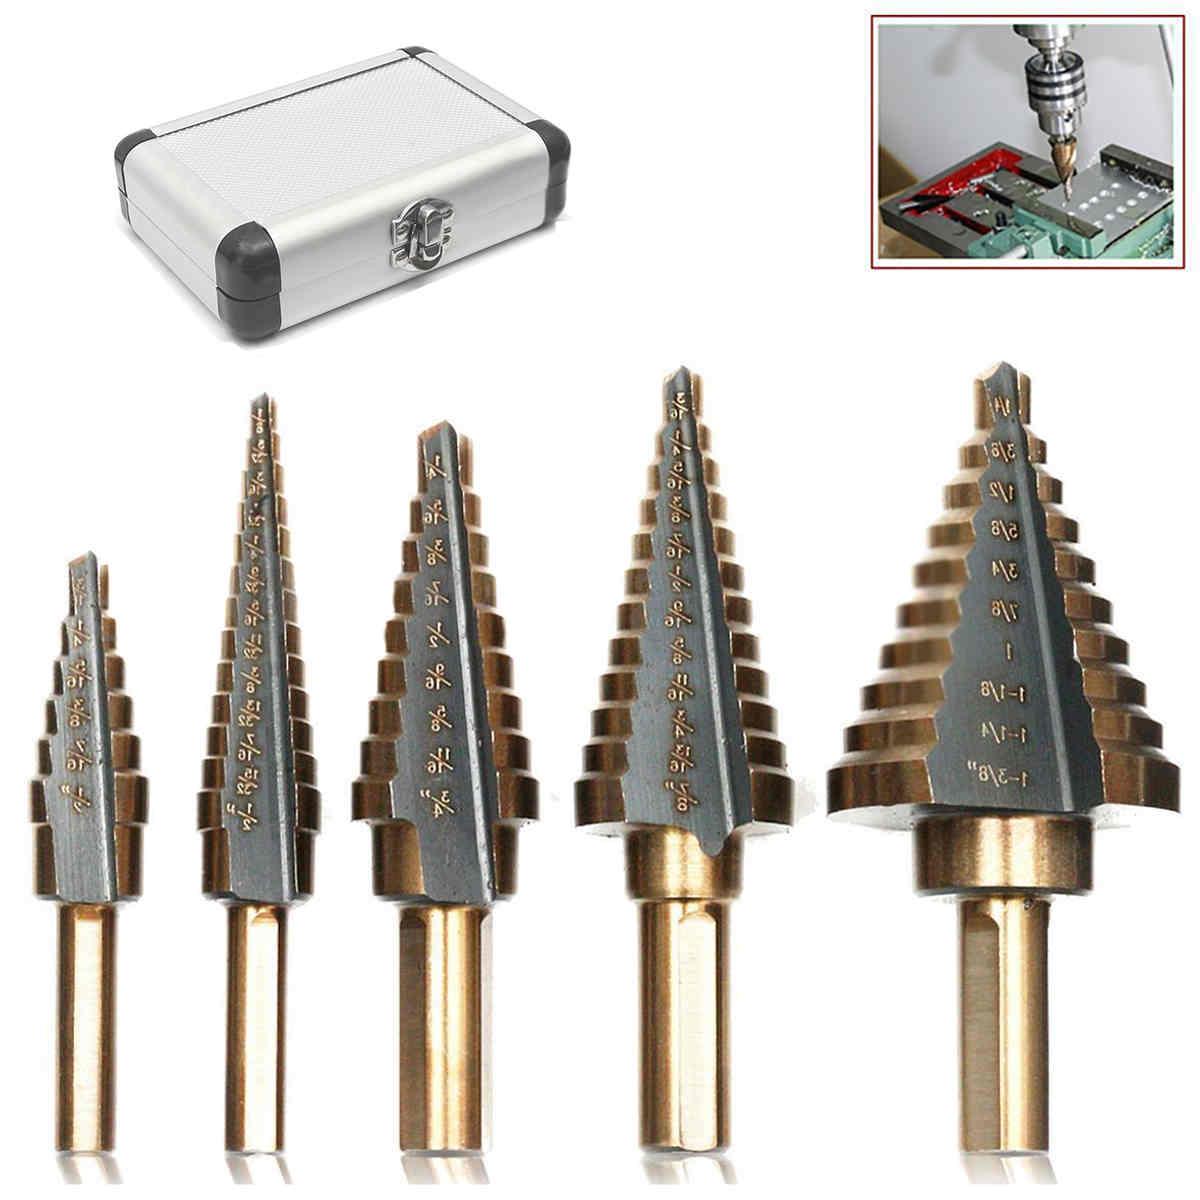 5pcs X HSS Large Cobalt Hole Titanium Cone Step Drill Bit Cutter Set Tools W/ Case